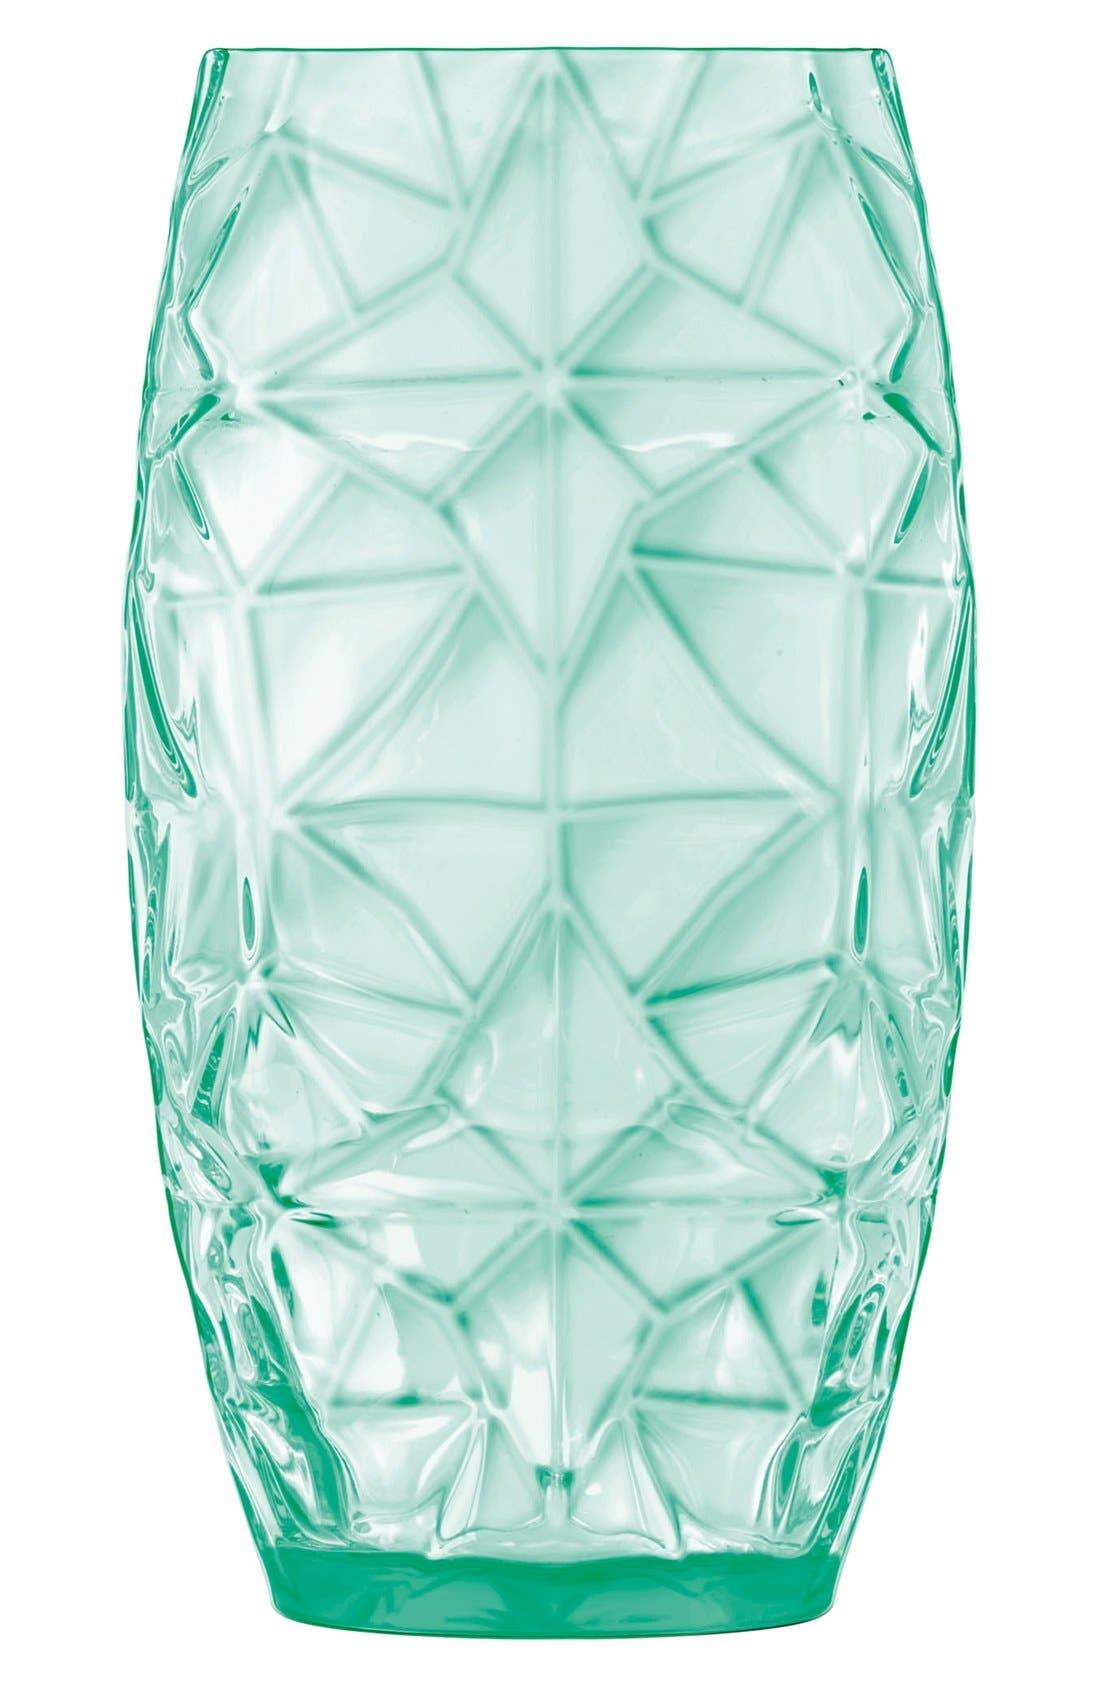 Main Image - Luigi Bormioli 'Prezioso' Beverage Glasses (Set of 4)